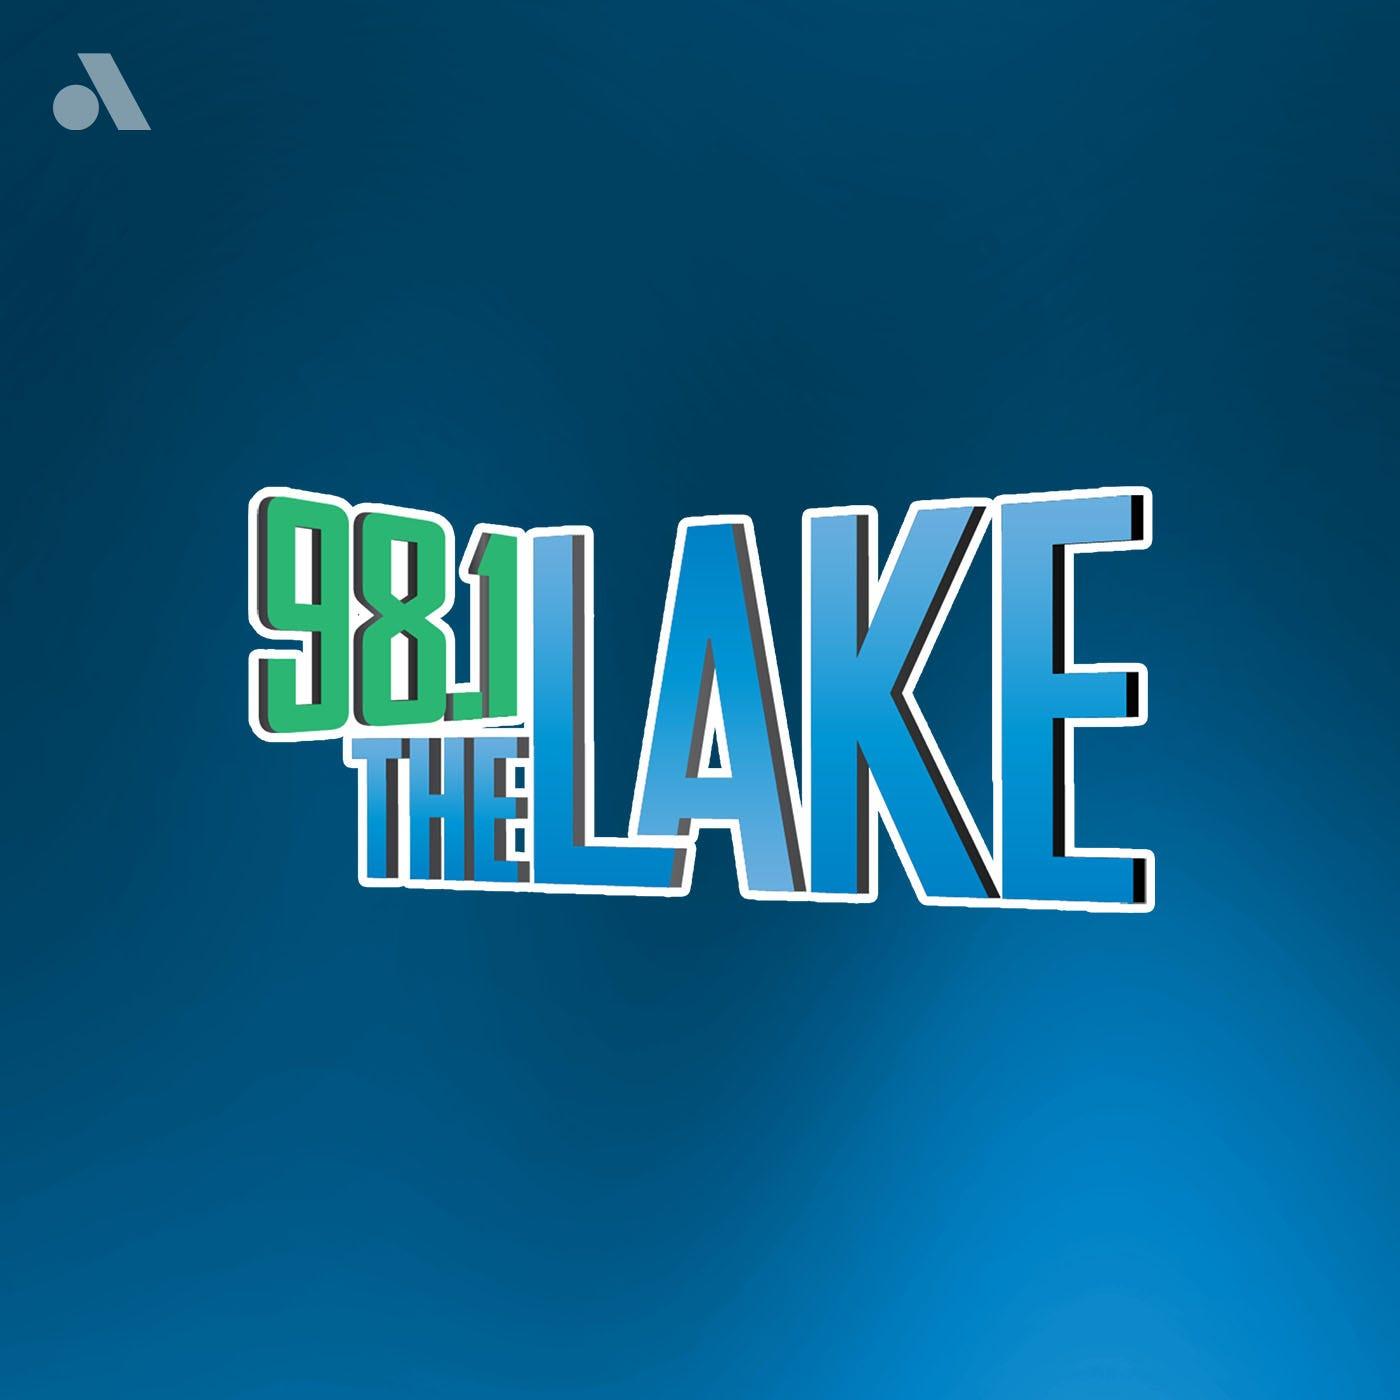 98.1 The Lake